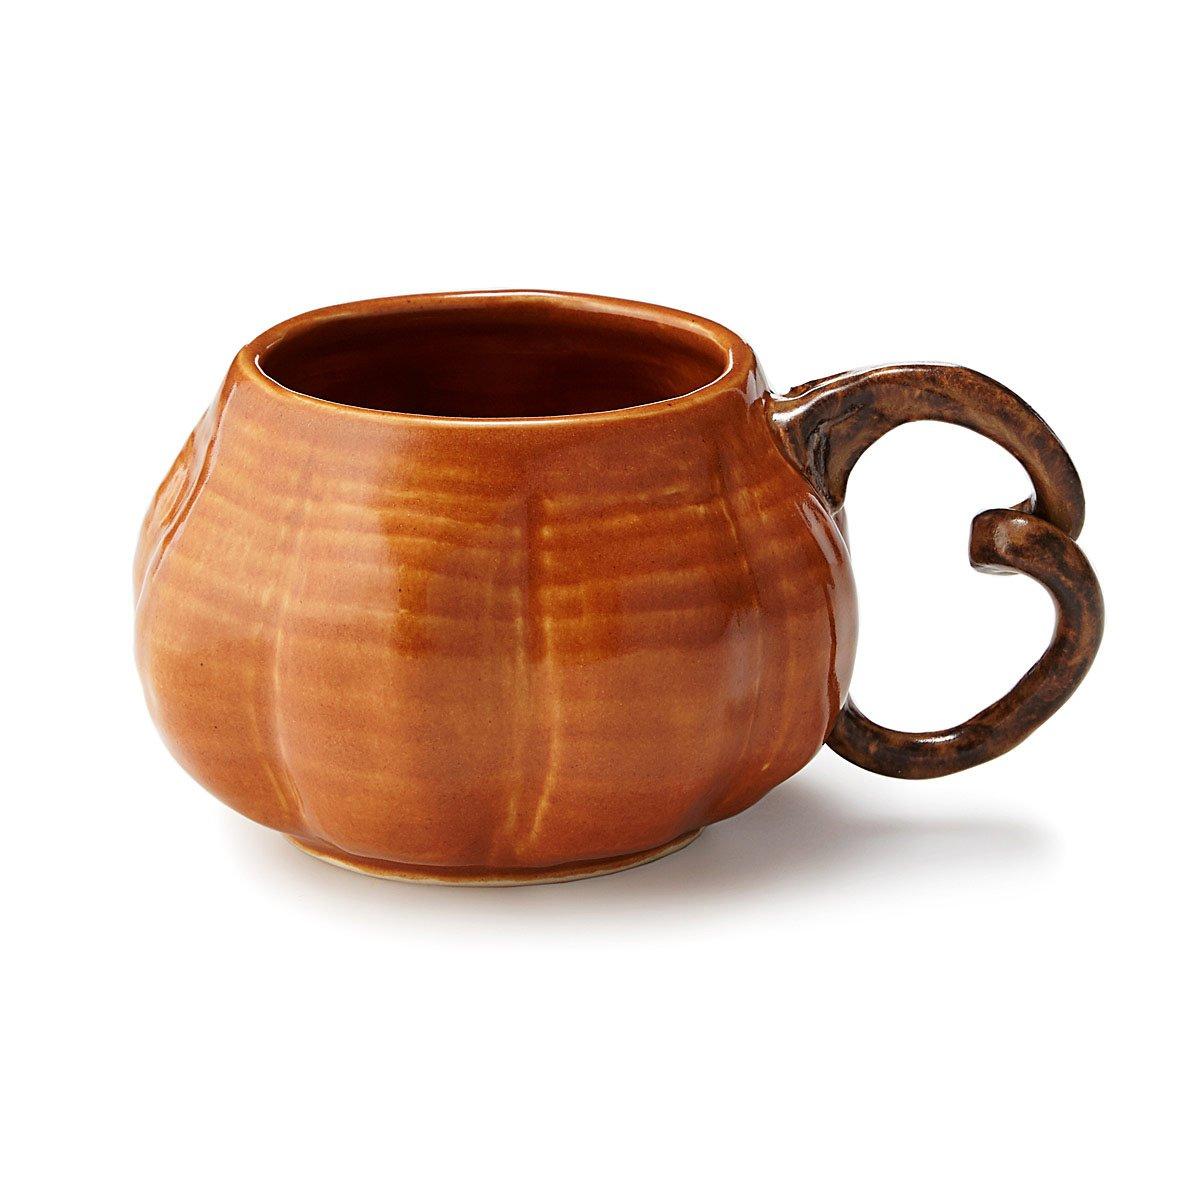 Sightly Pumpkin Spice Coffee Mug Pumpkin Spice Coffee Mug Green Head Shaped Coffee Mugs Wholesale Shaped Coffee Mugs furniture Funny Shaped Coffee Mugs